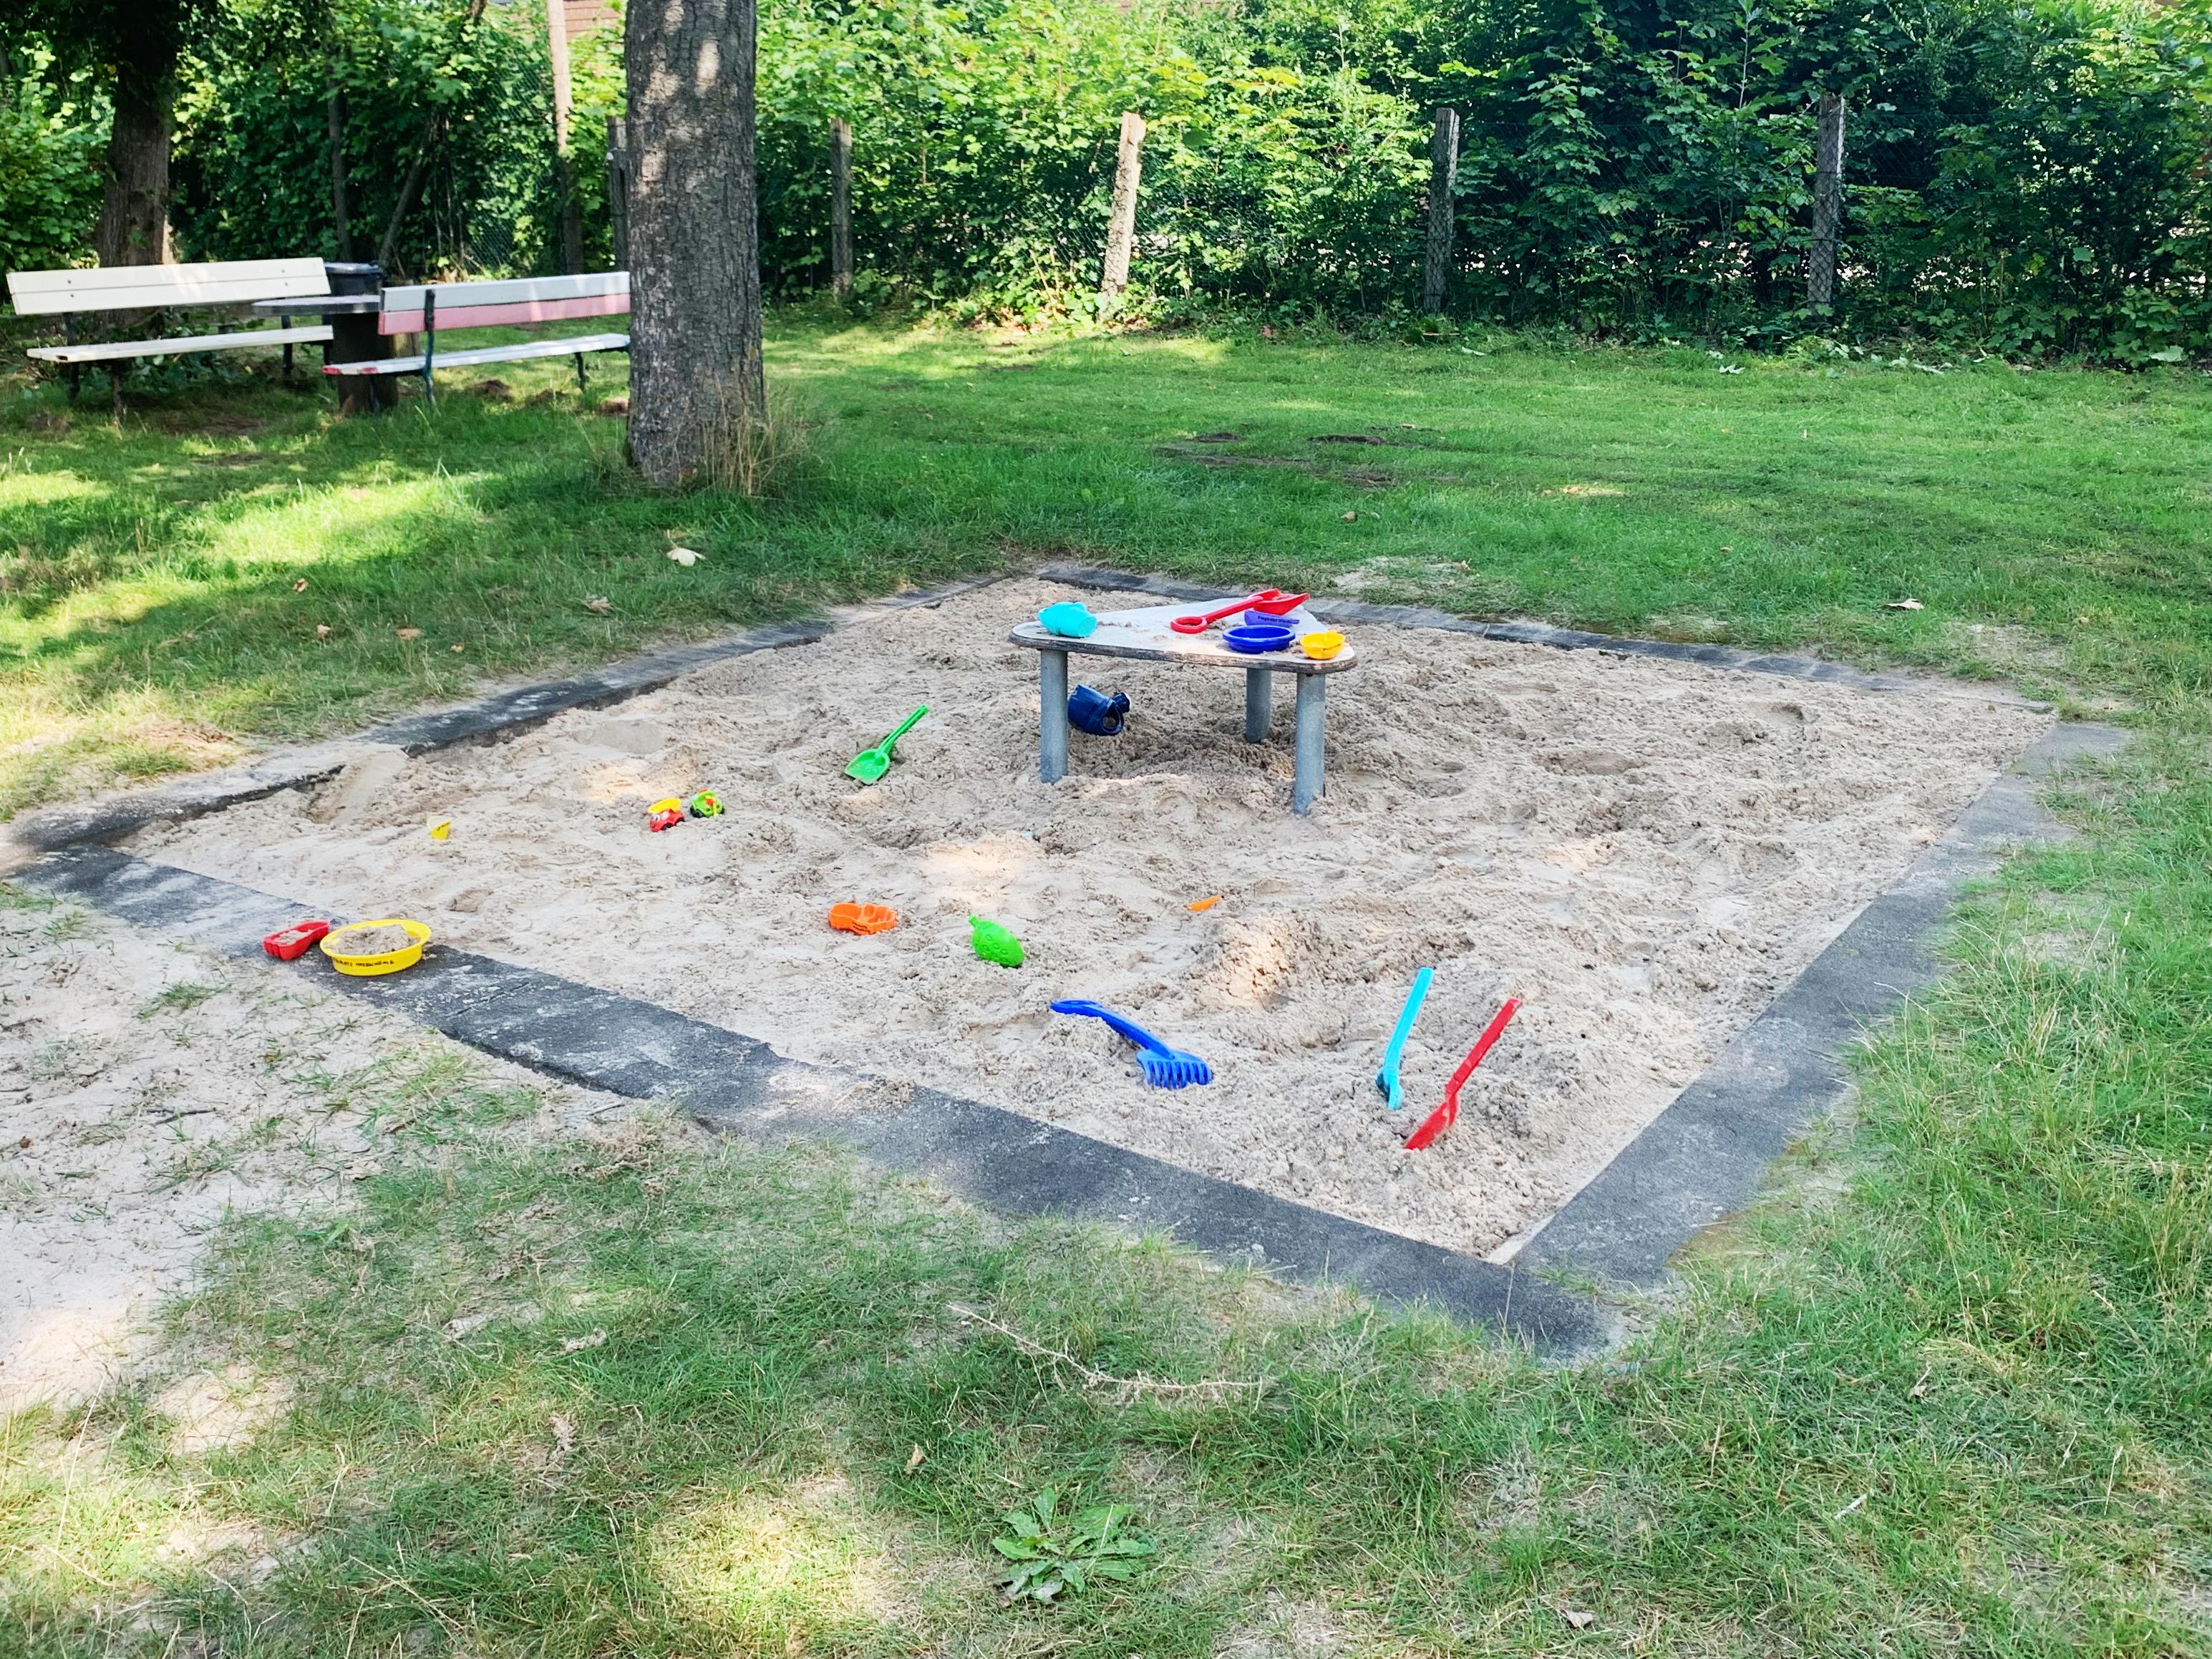 Sandkasten Platzaktion